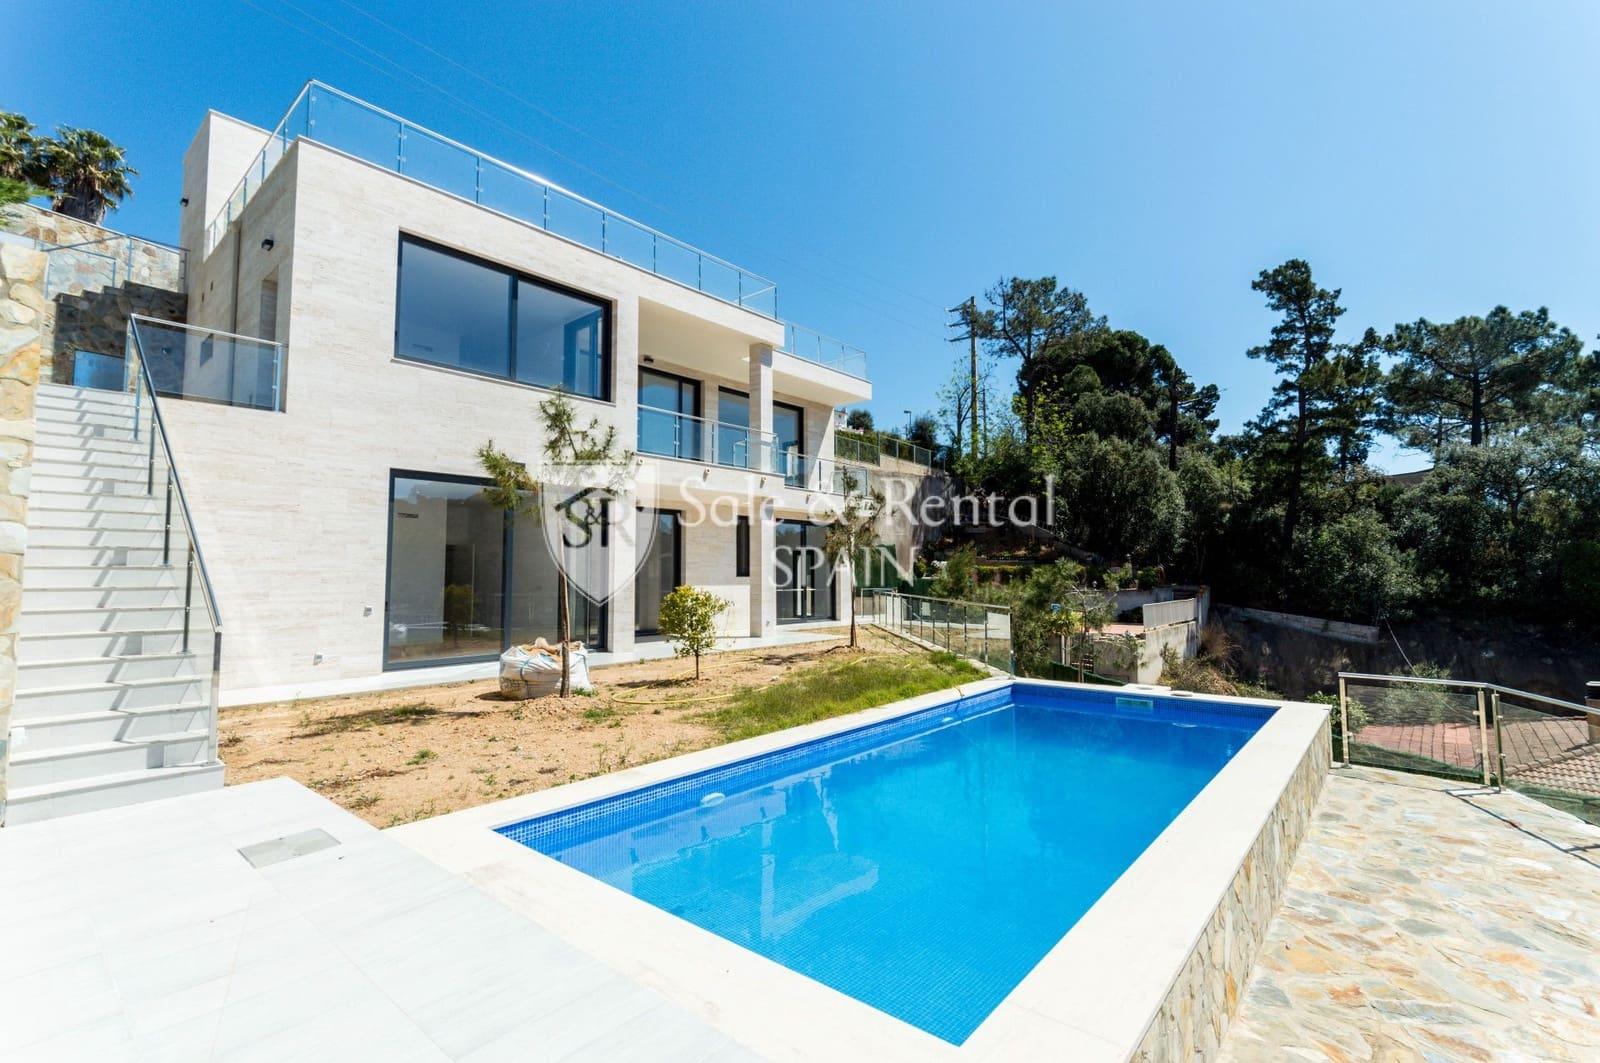 4 bedroom Villa for sale in Lloret de Mar with pool garage - € 950,000 (Ref: 6041028)